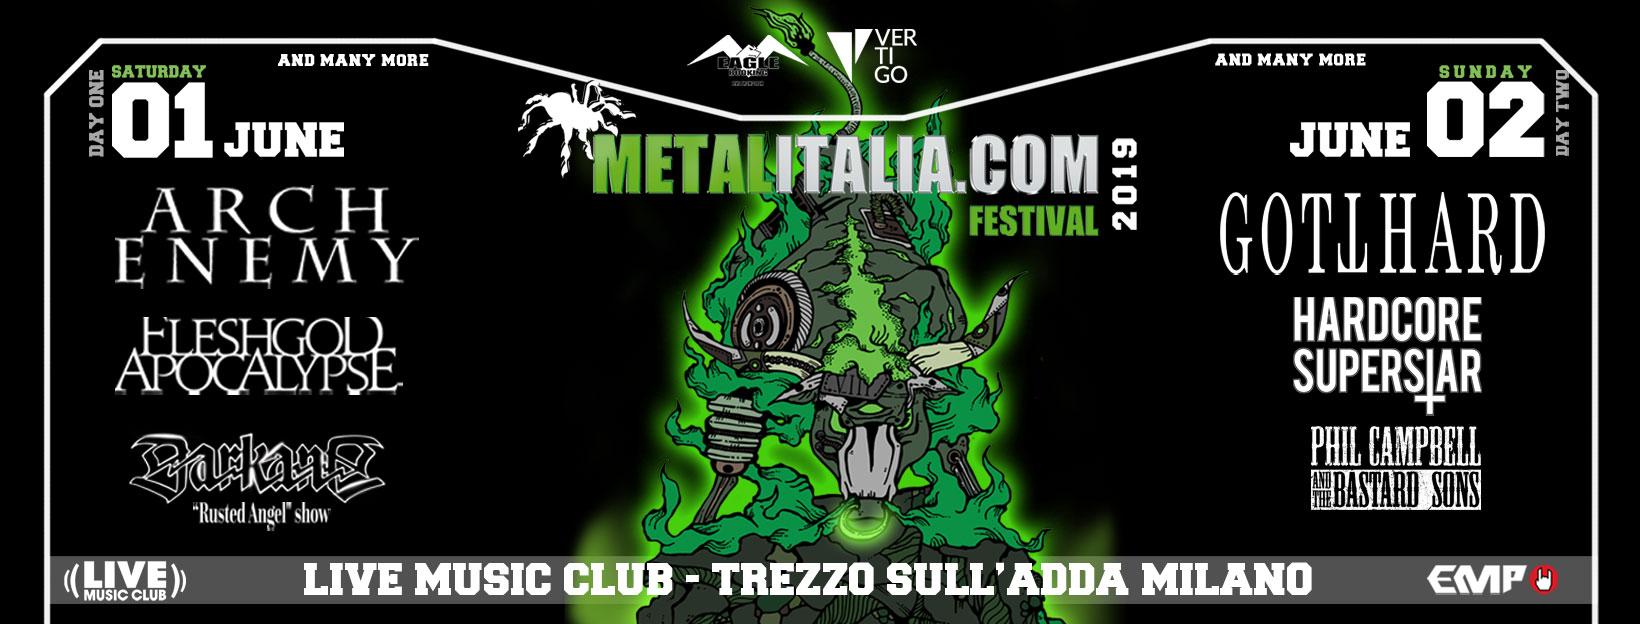 METALITALIA FEST - Confermate le prime band